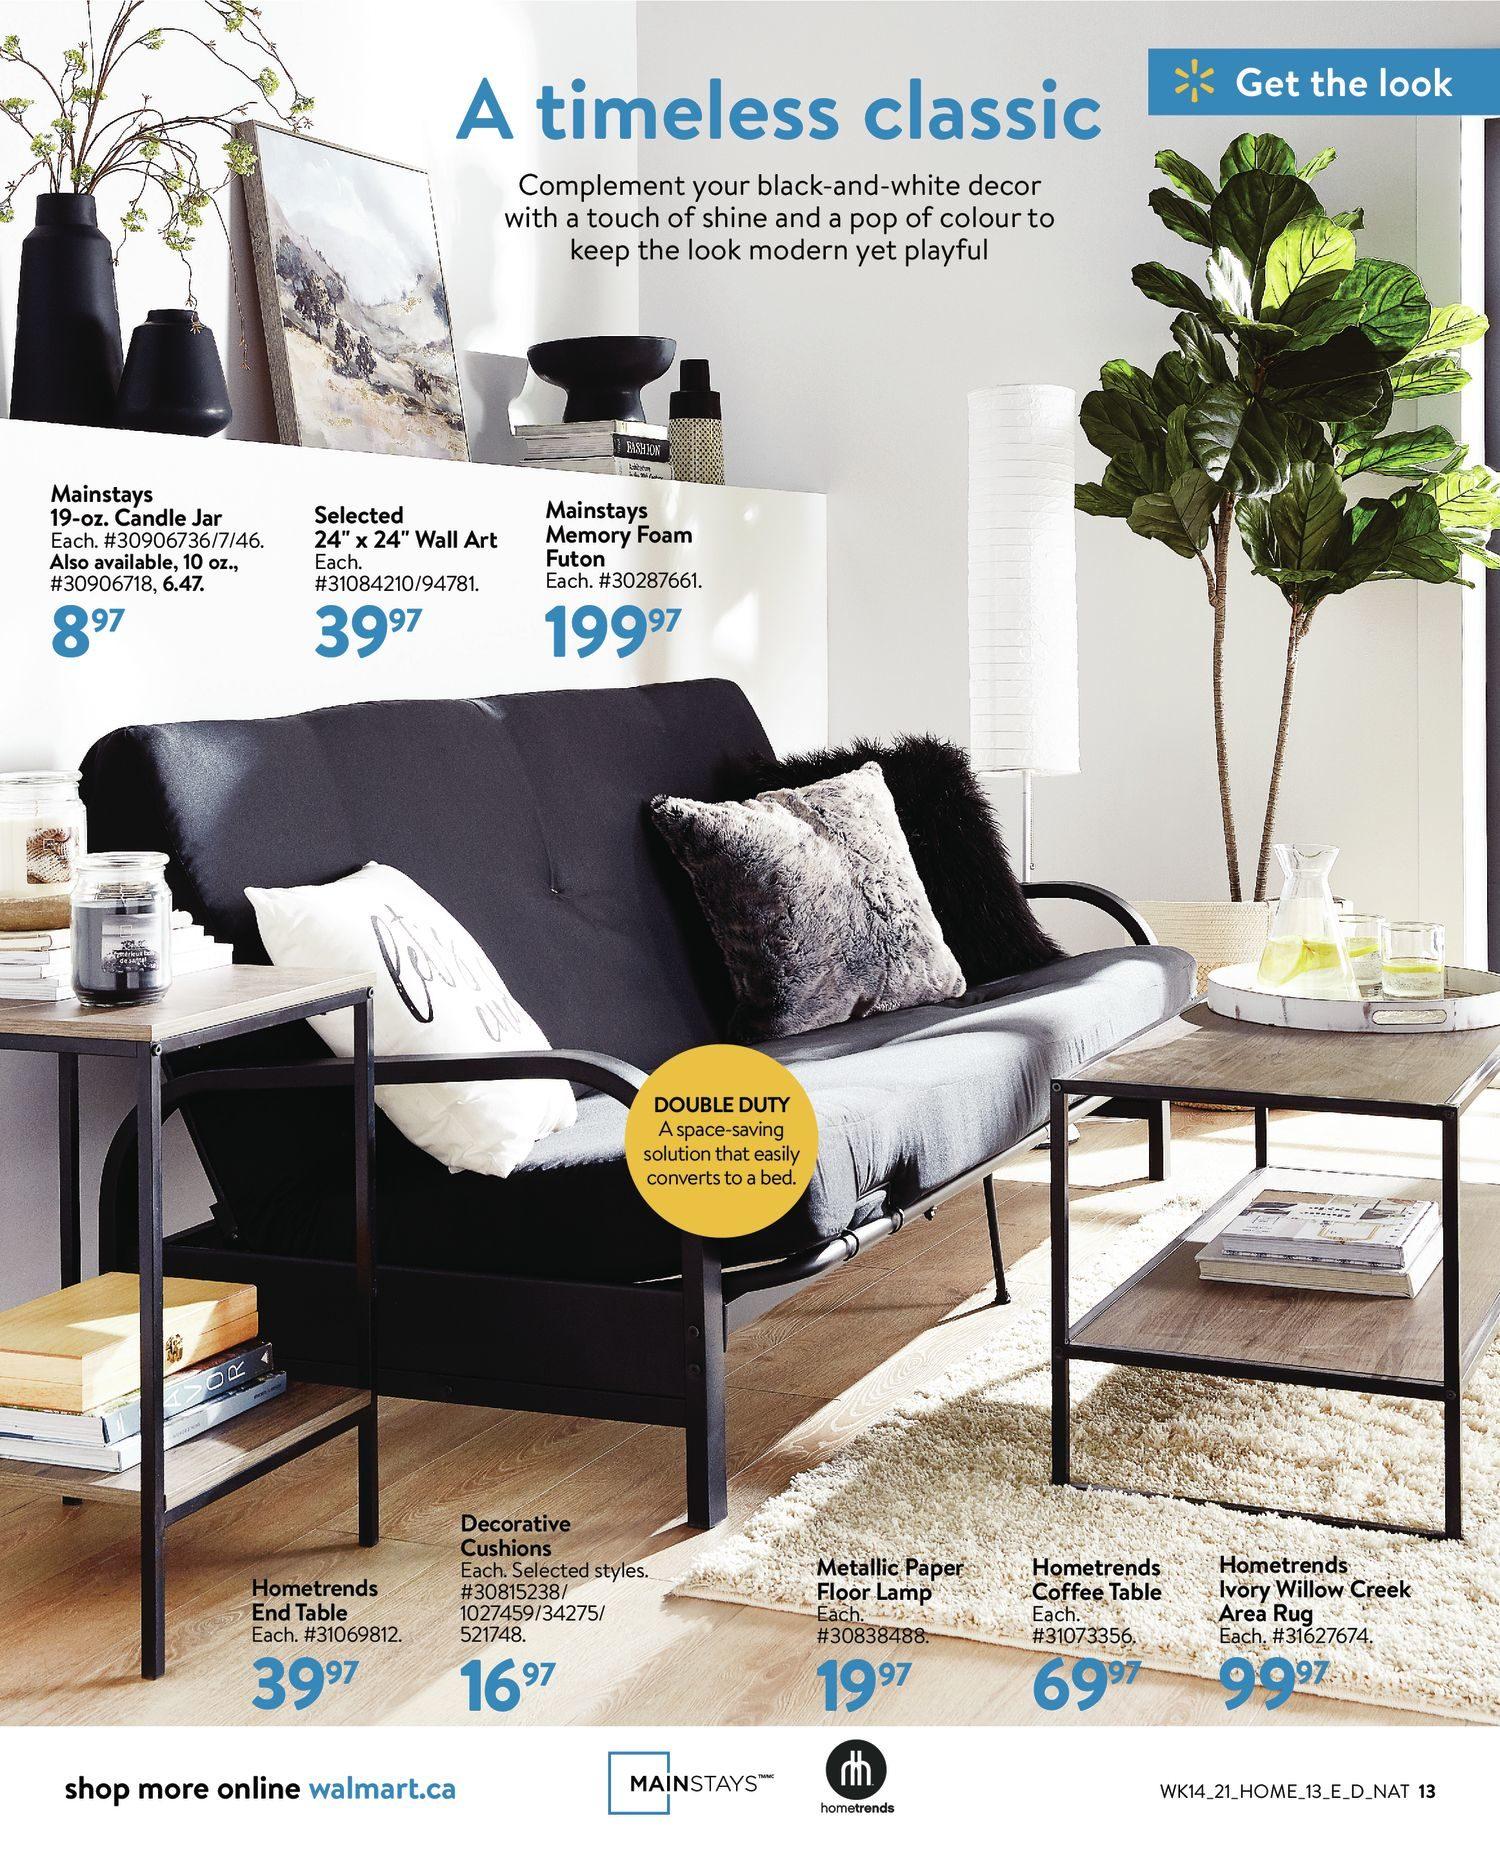 Walmart - Home Book - Page 13